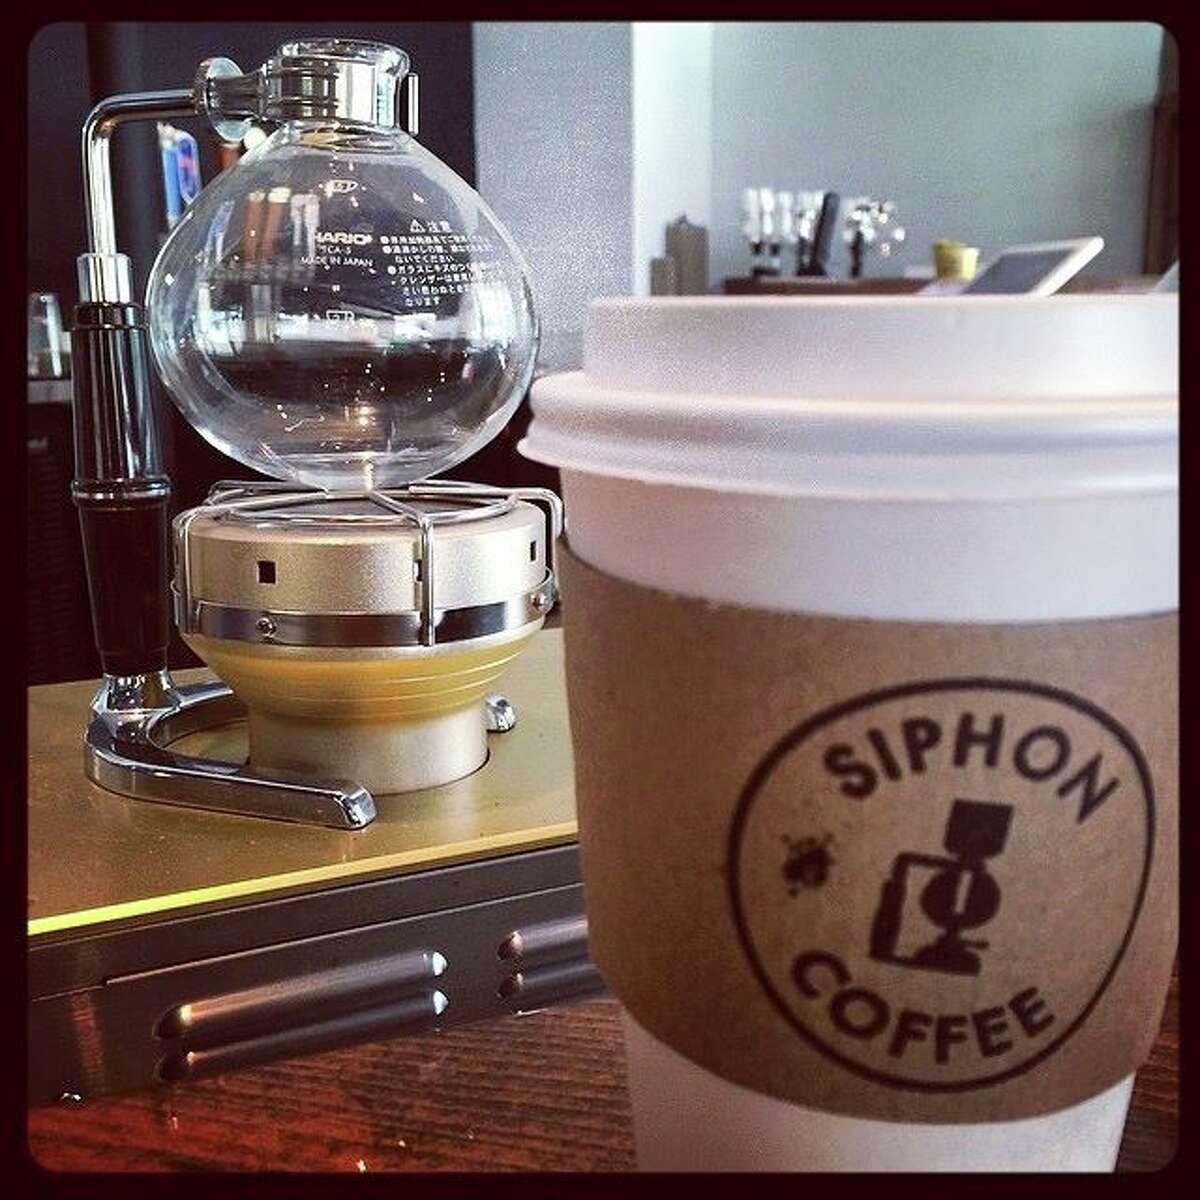 Siphon Coffee 701 W. Alabama